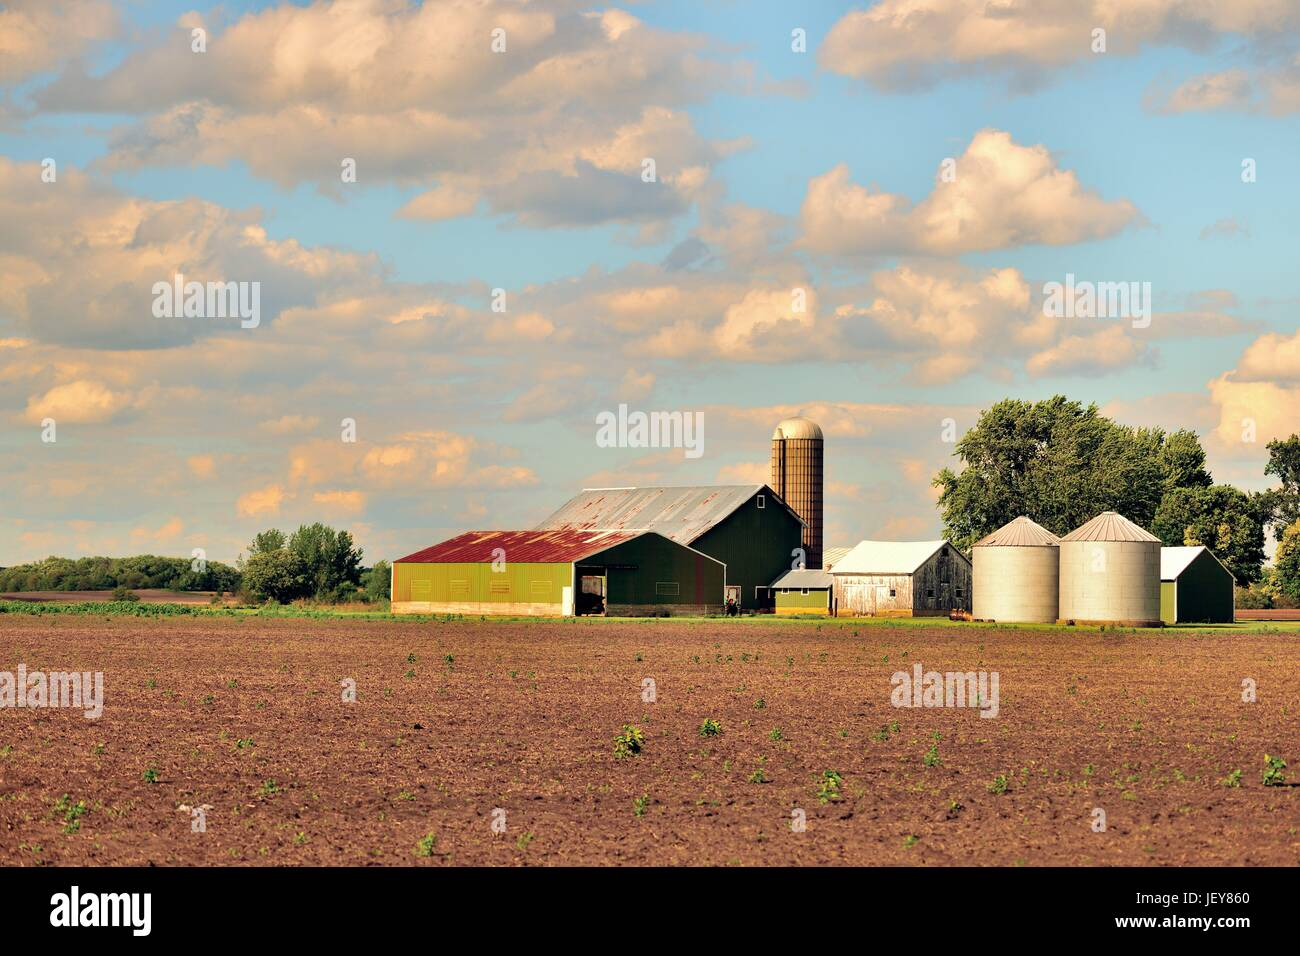 Burlington, Illinois, USA. A variety of farm buildings provide a serene setting on an Illinois farm. - Stock Image